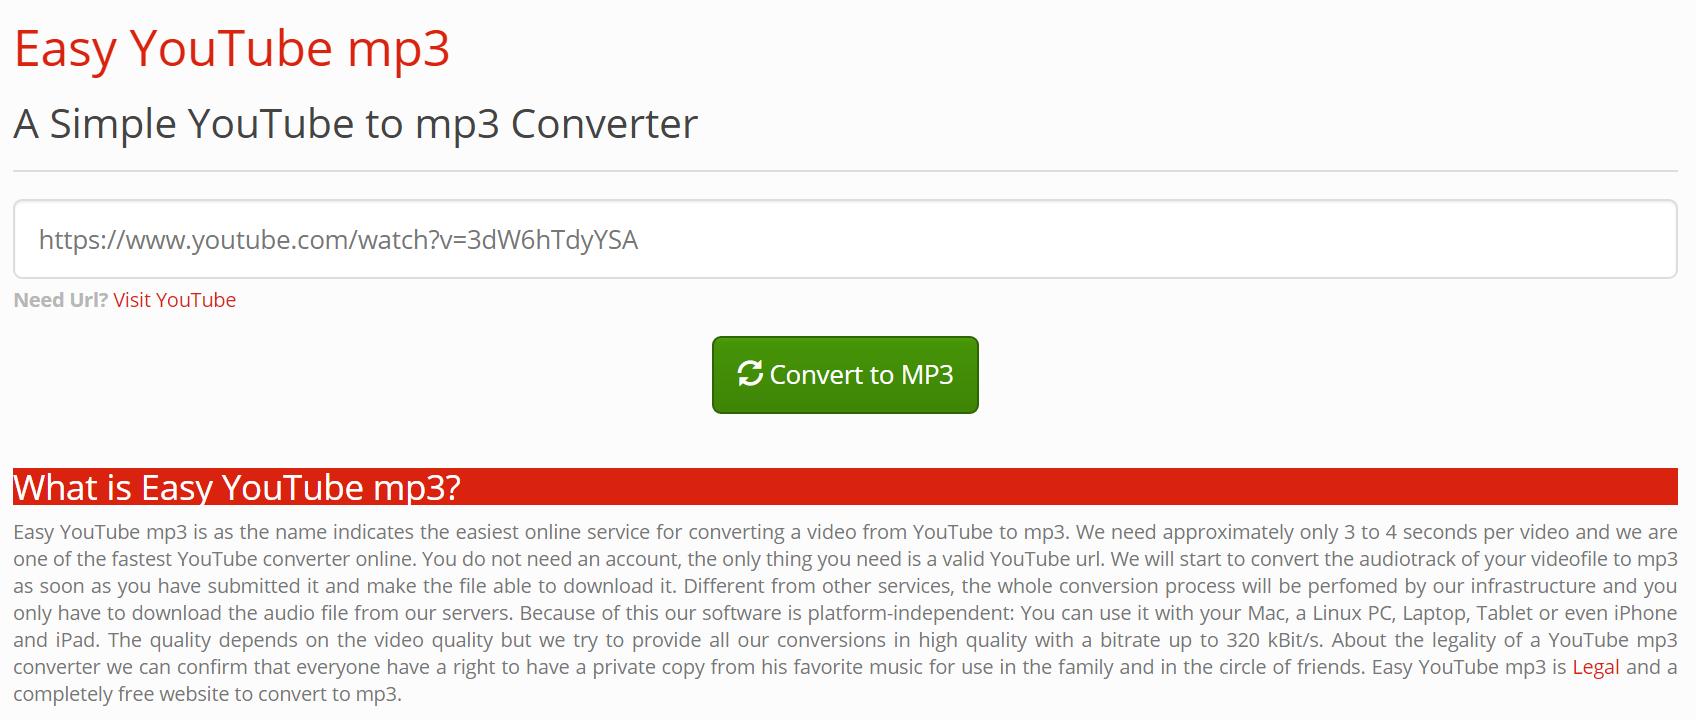 Easy YouTube mp3のメイン画面